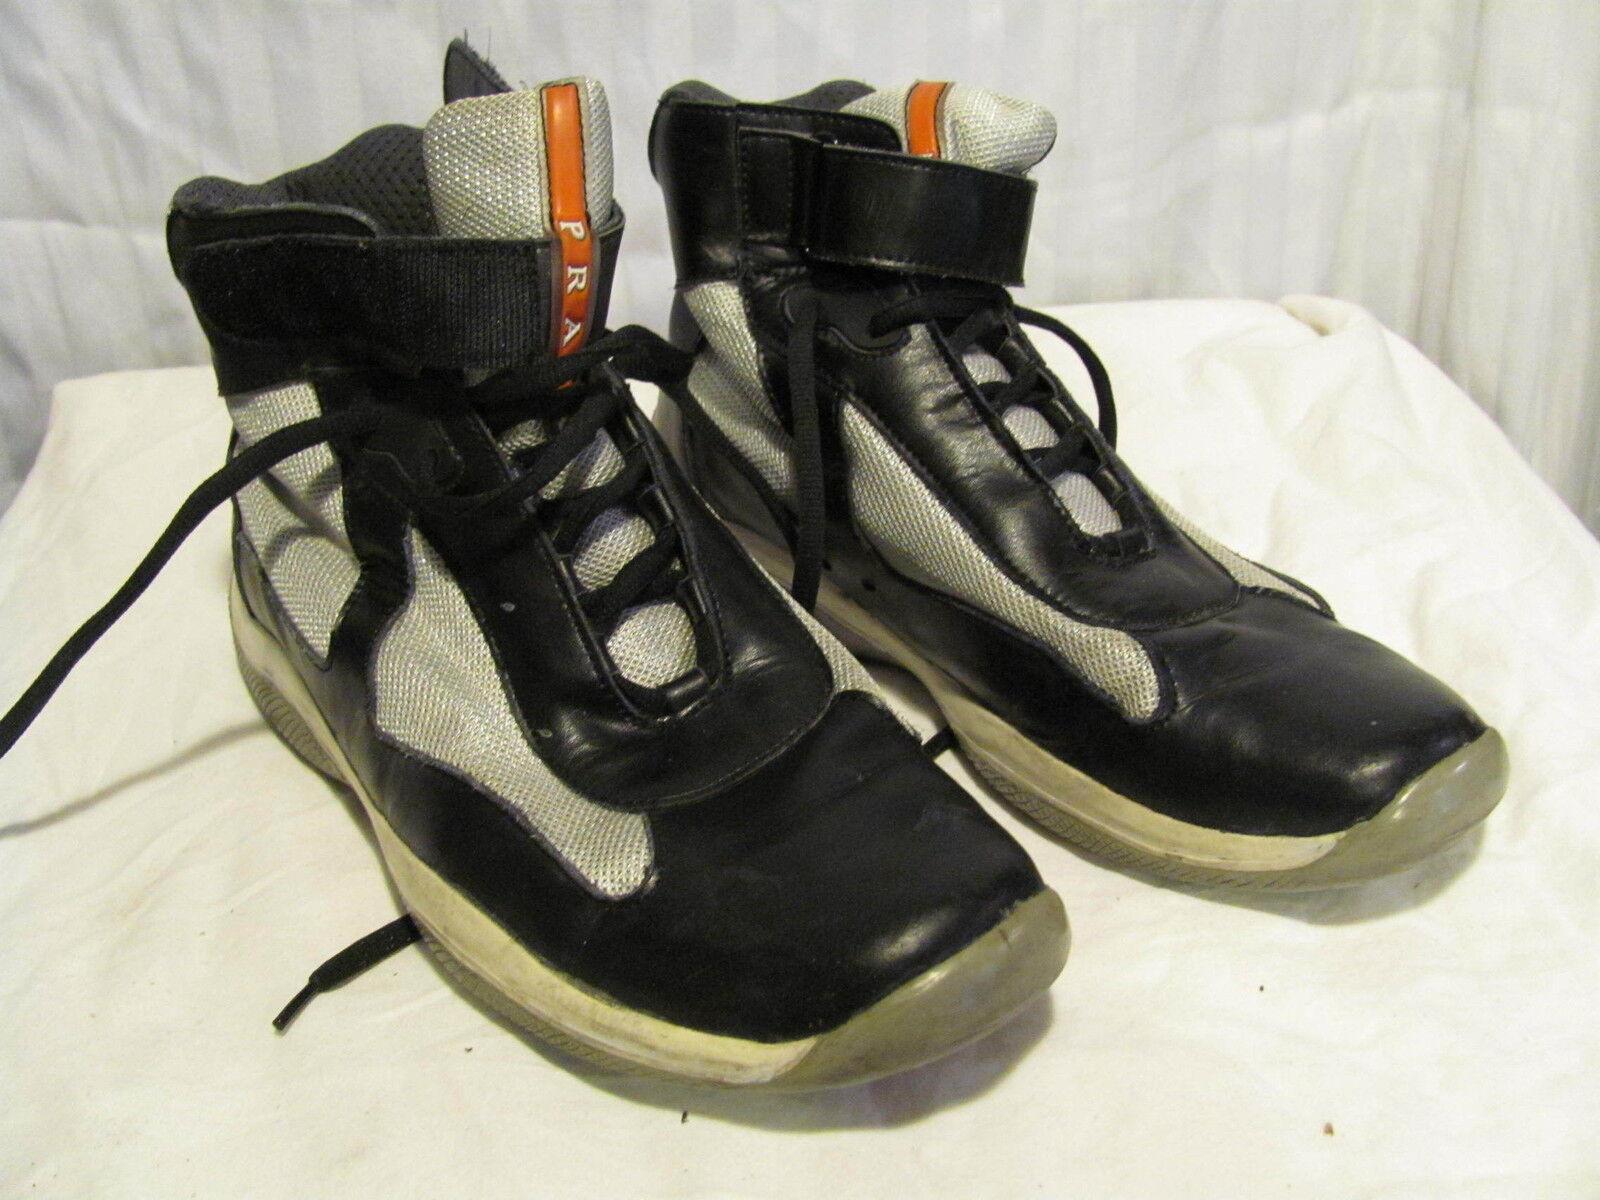 Rare Prada tennis shoes Calzature men Skiskolaer PS906 9